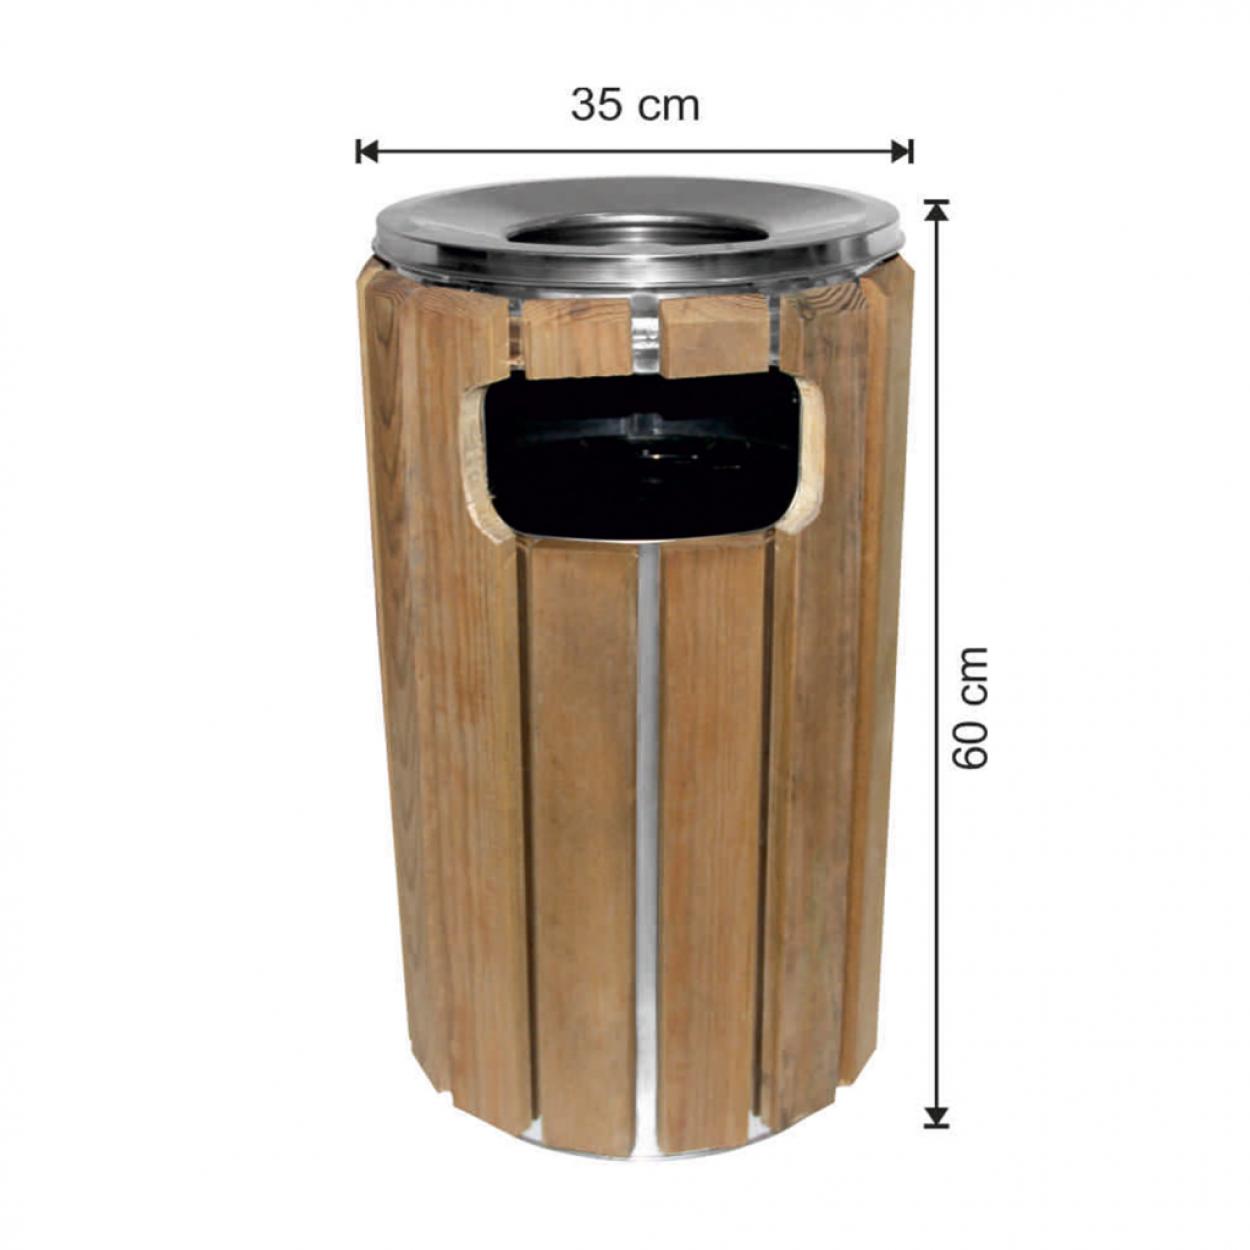 Ahşap Dekorlu Yuvarlak Çöp Kovası 57 Litre